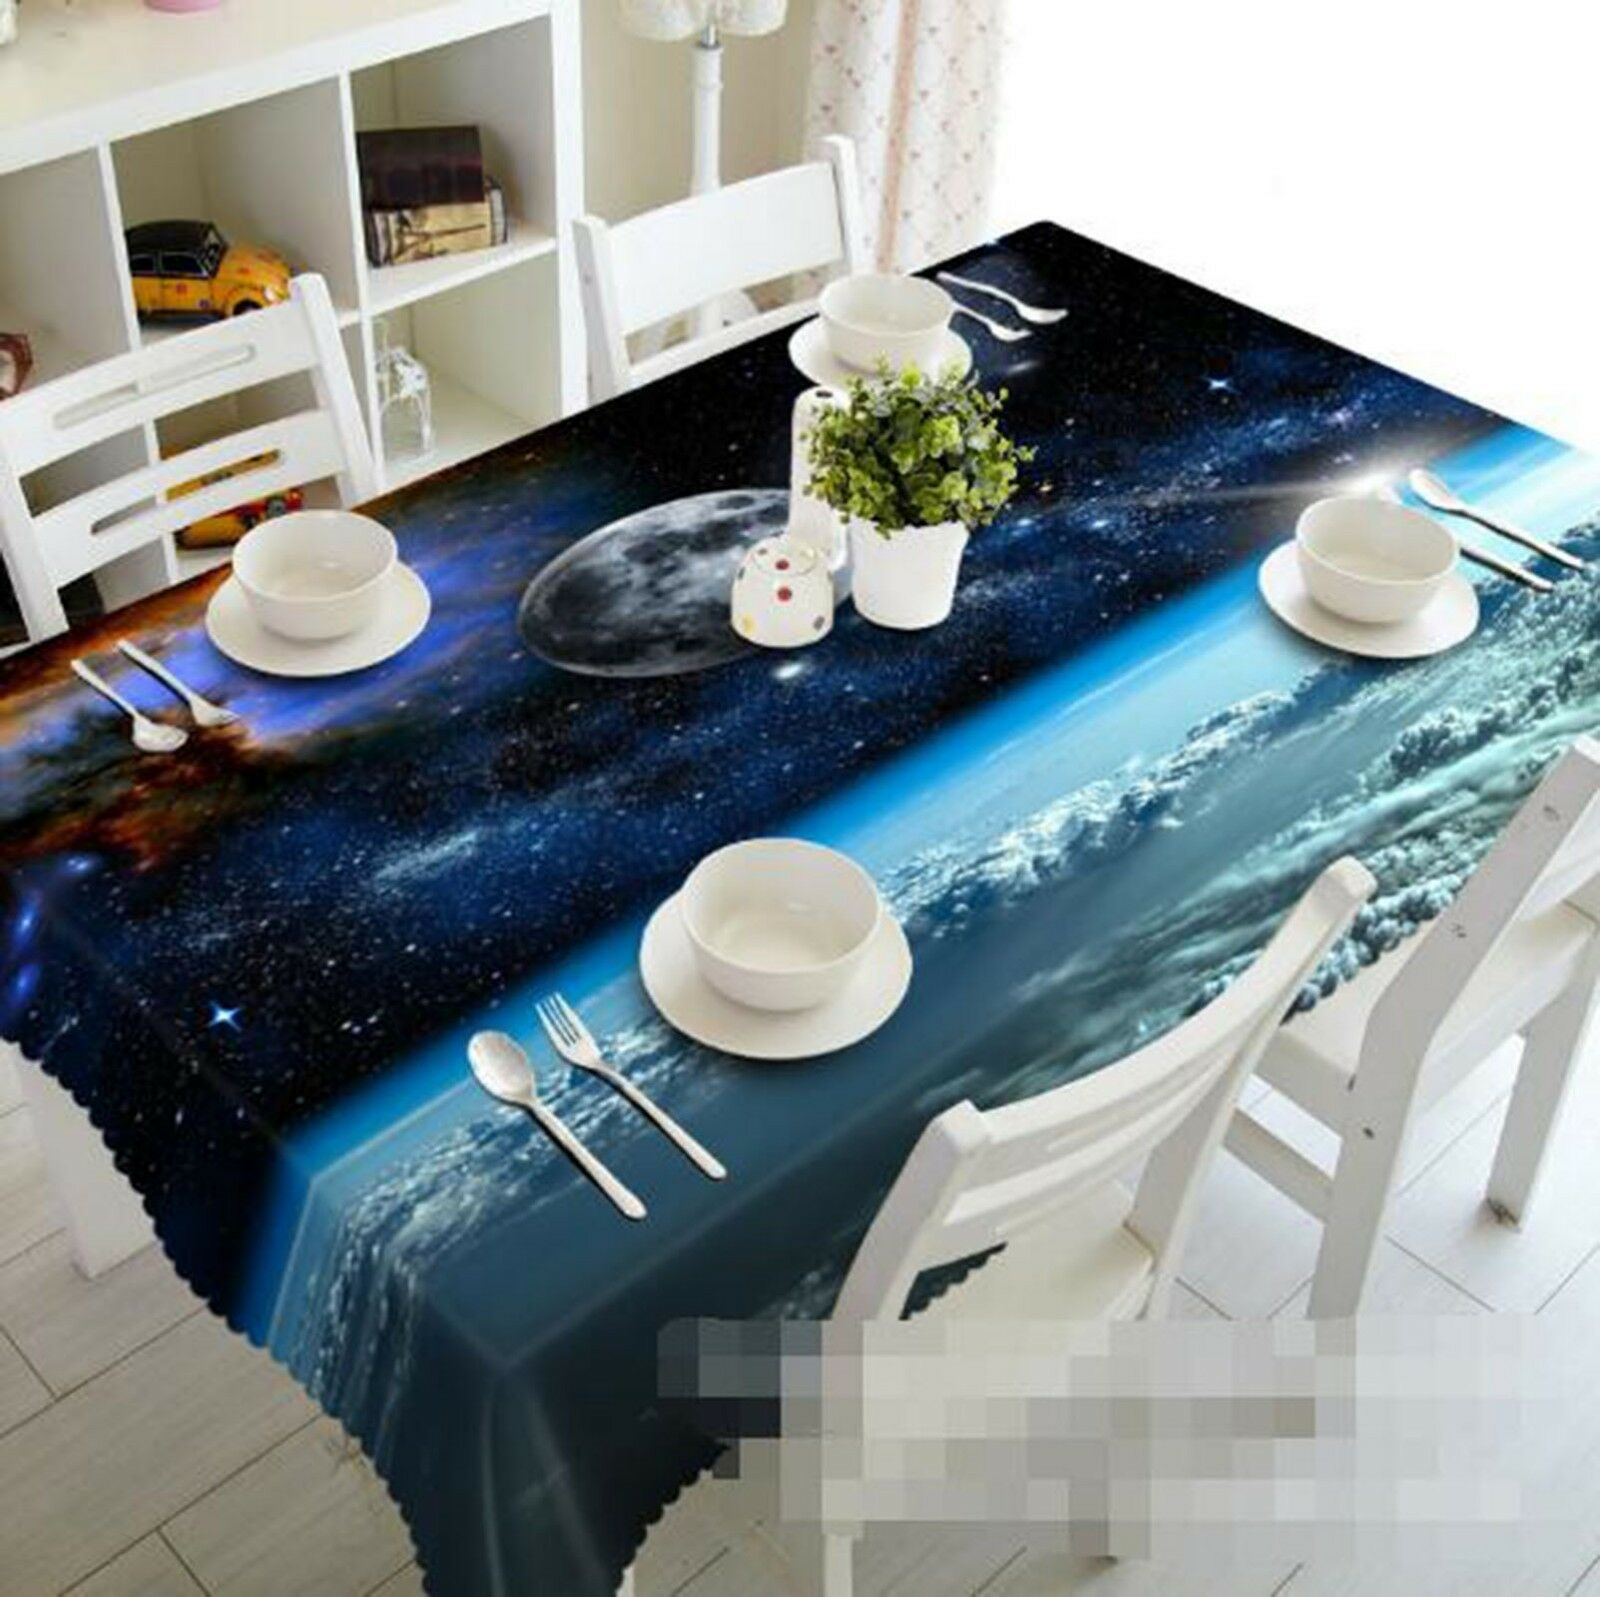 3D Planet Blau 024 Tablecloth Table Cover Cloth Birthday Party Event AJ Lemon